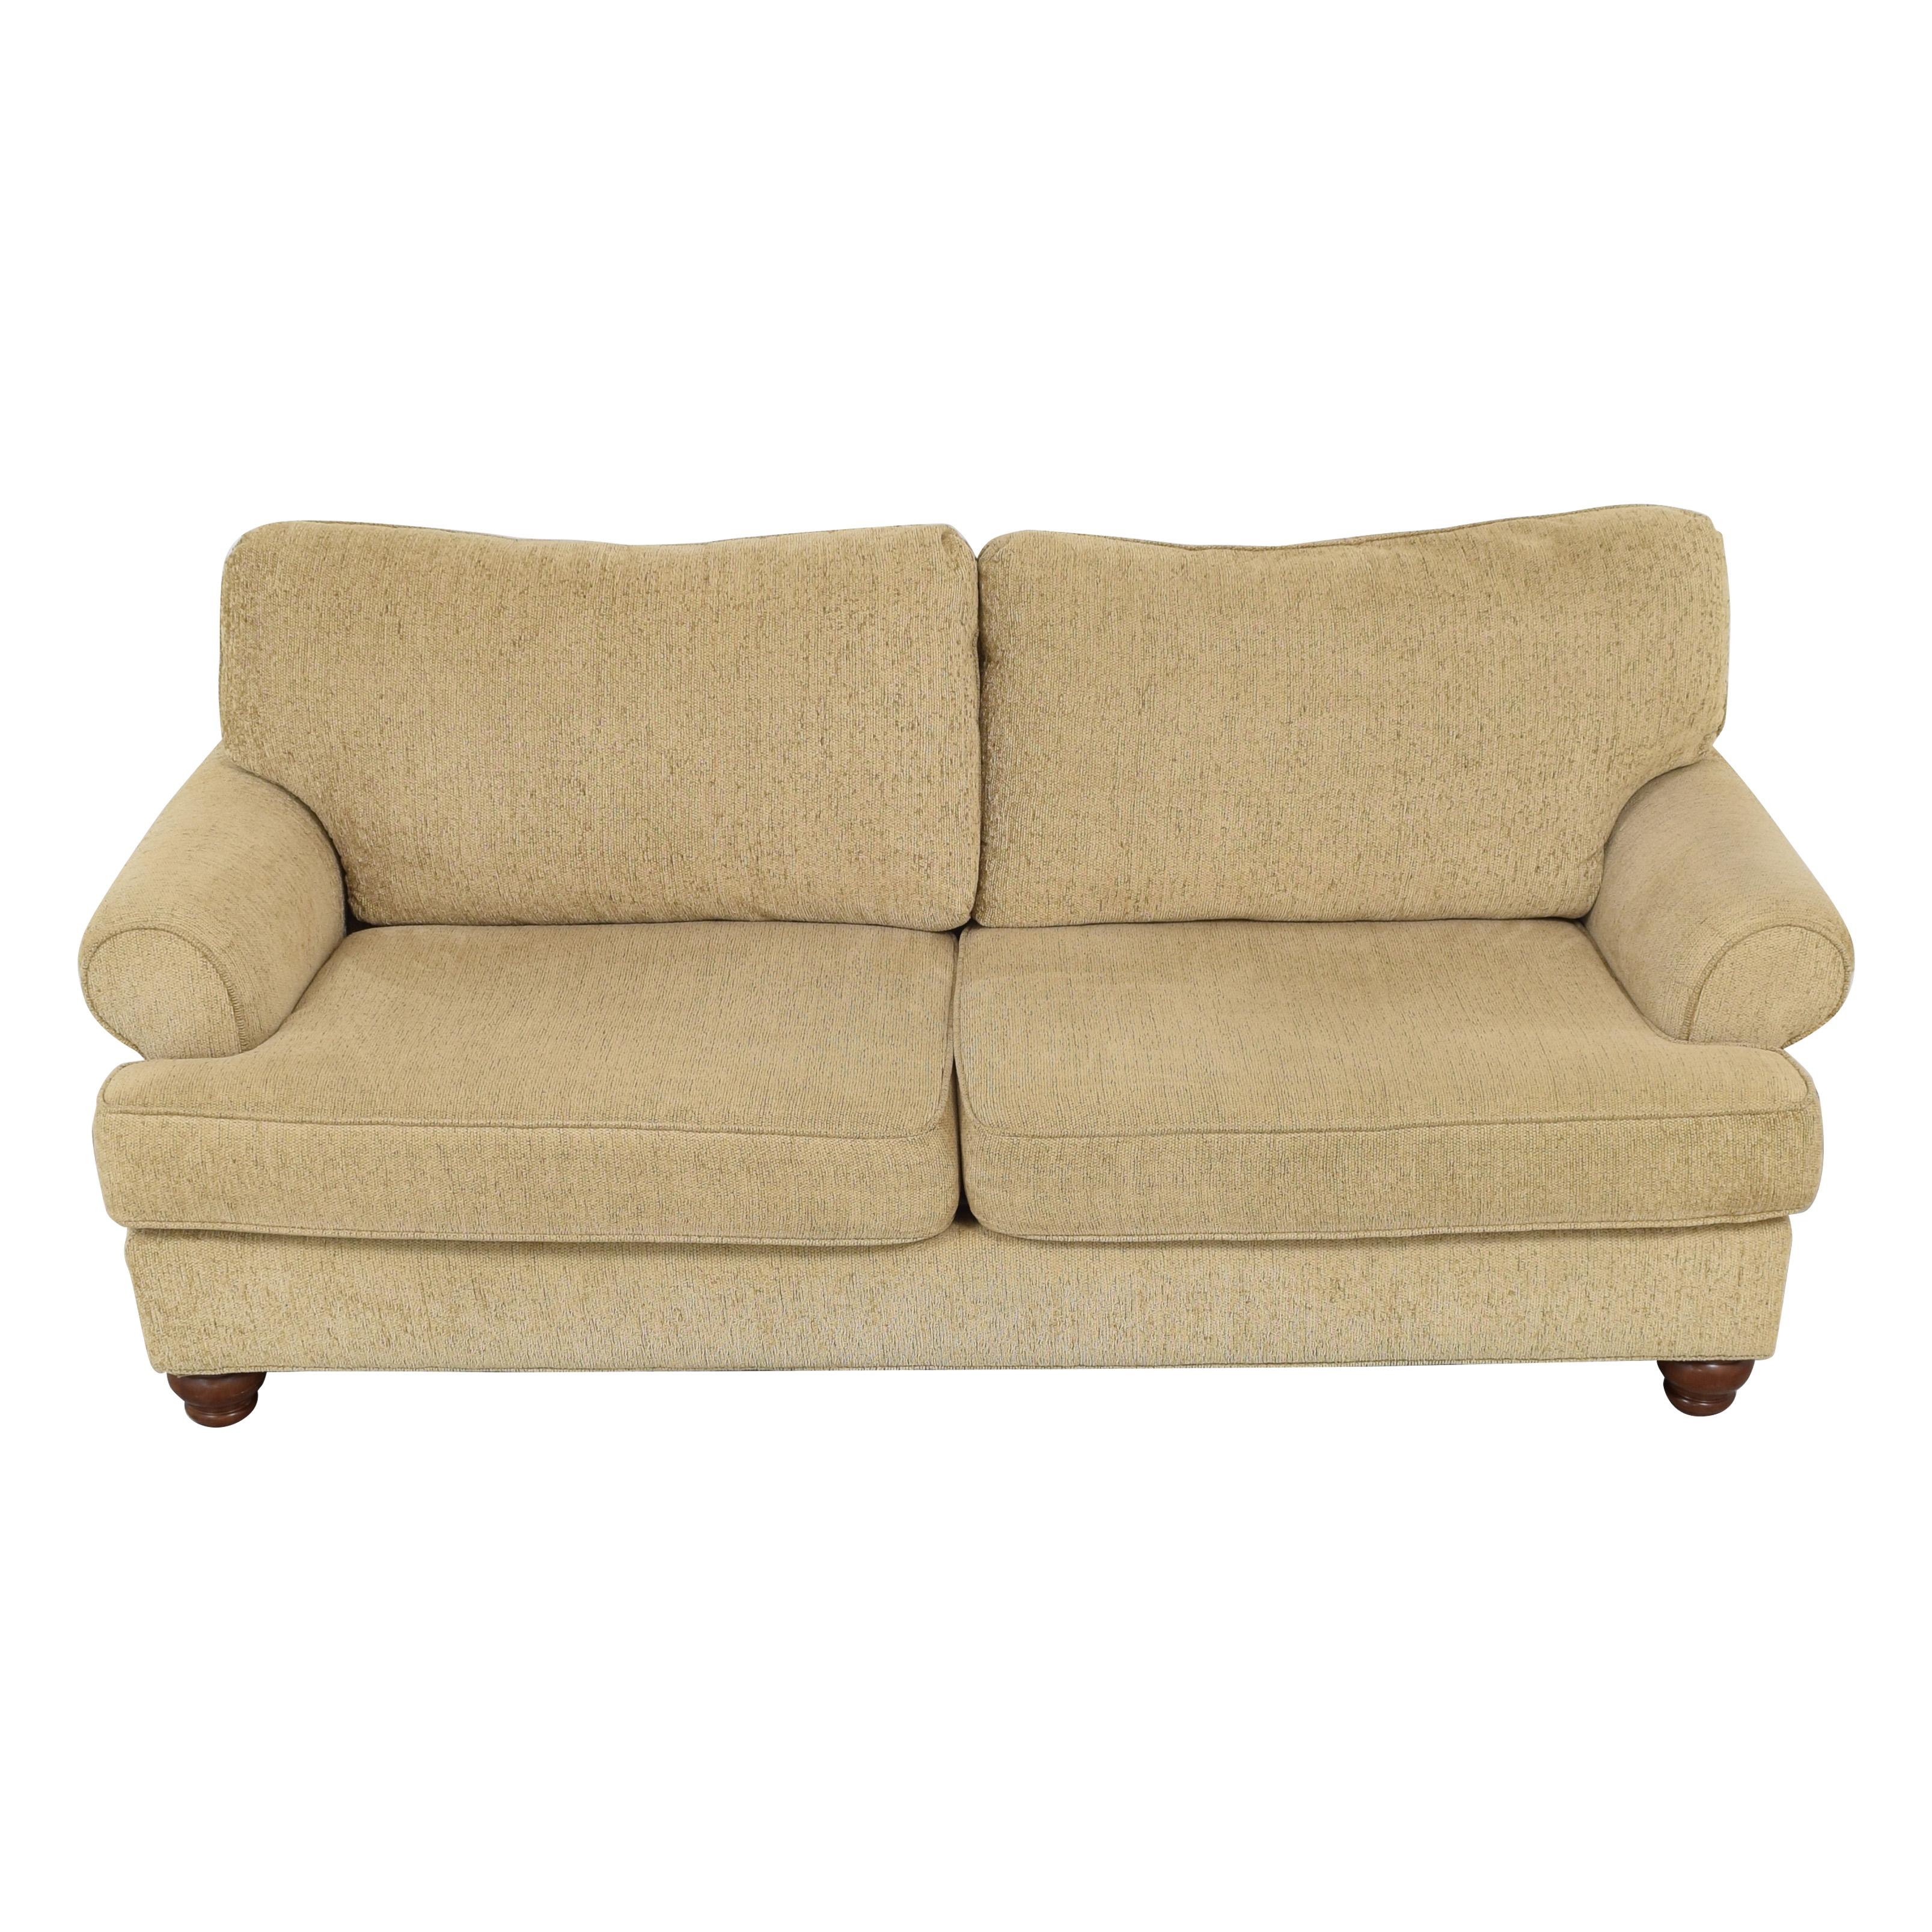 Craftmaster Furniture Craftmaster Furniture Two Cushion Sofa coupon